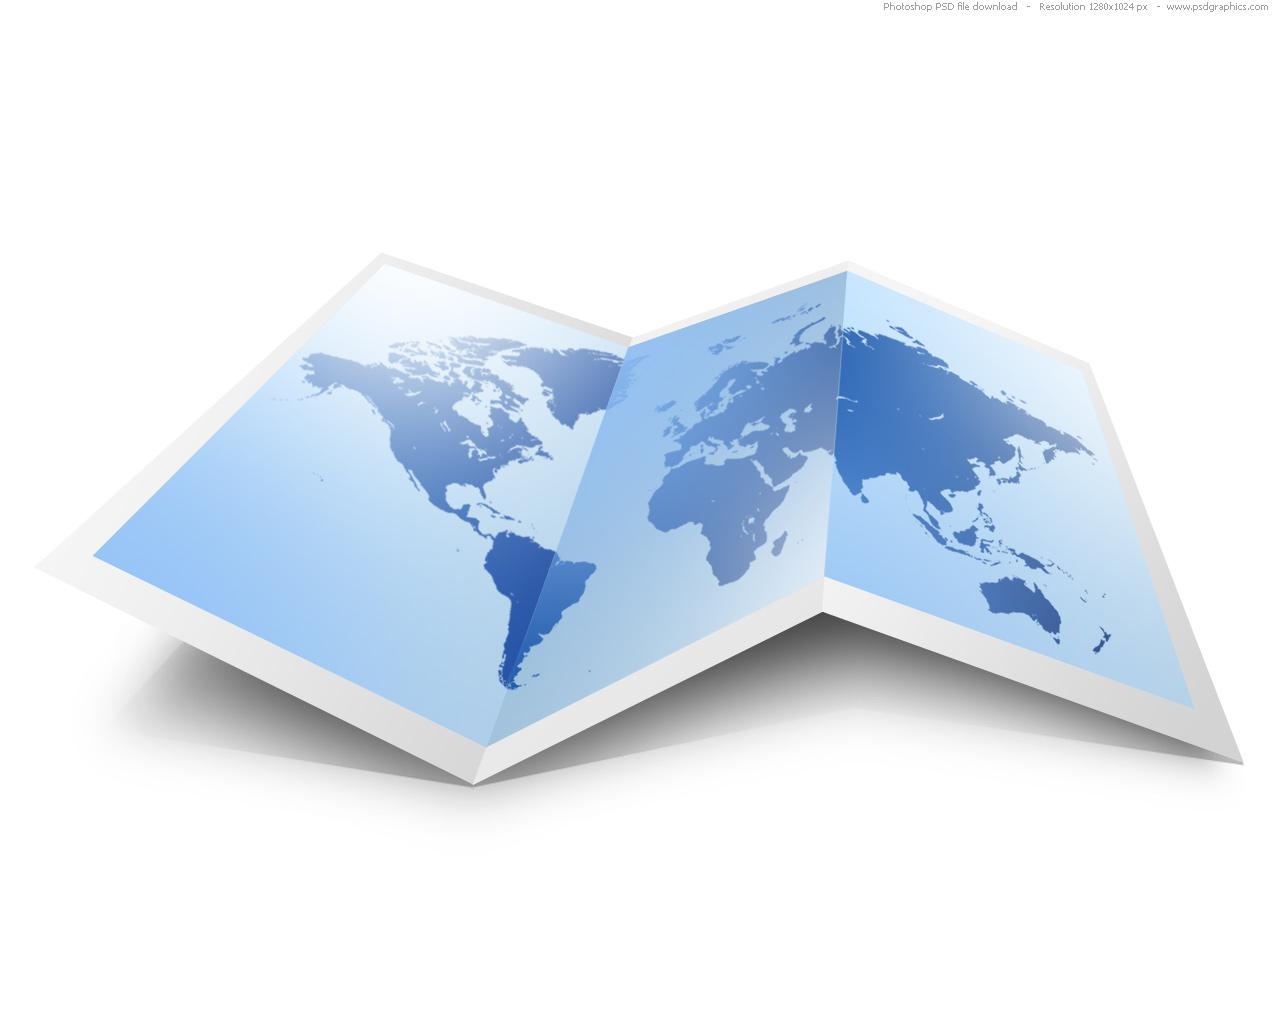 14 Folded Map Icon Images